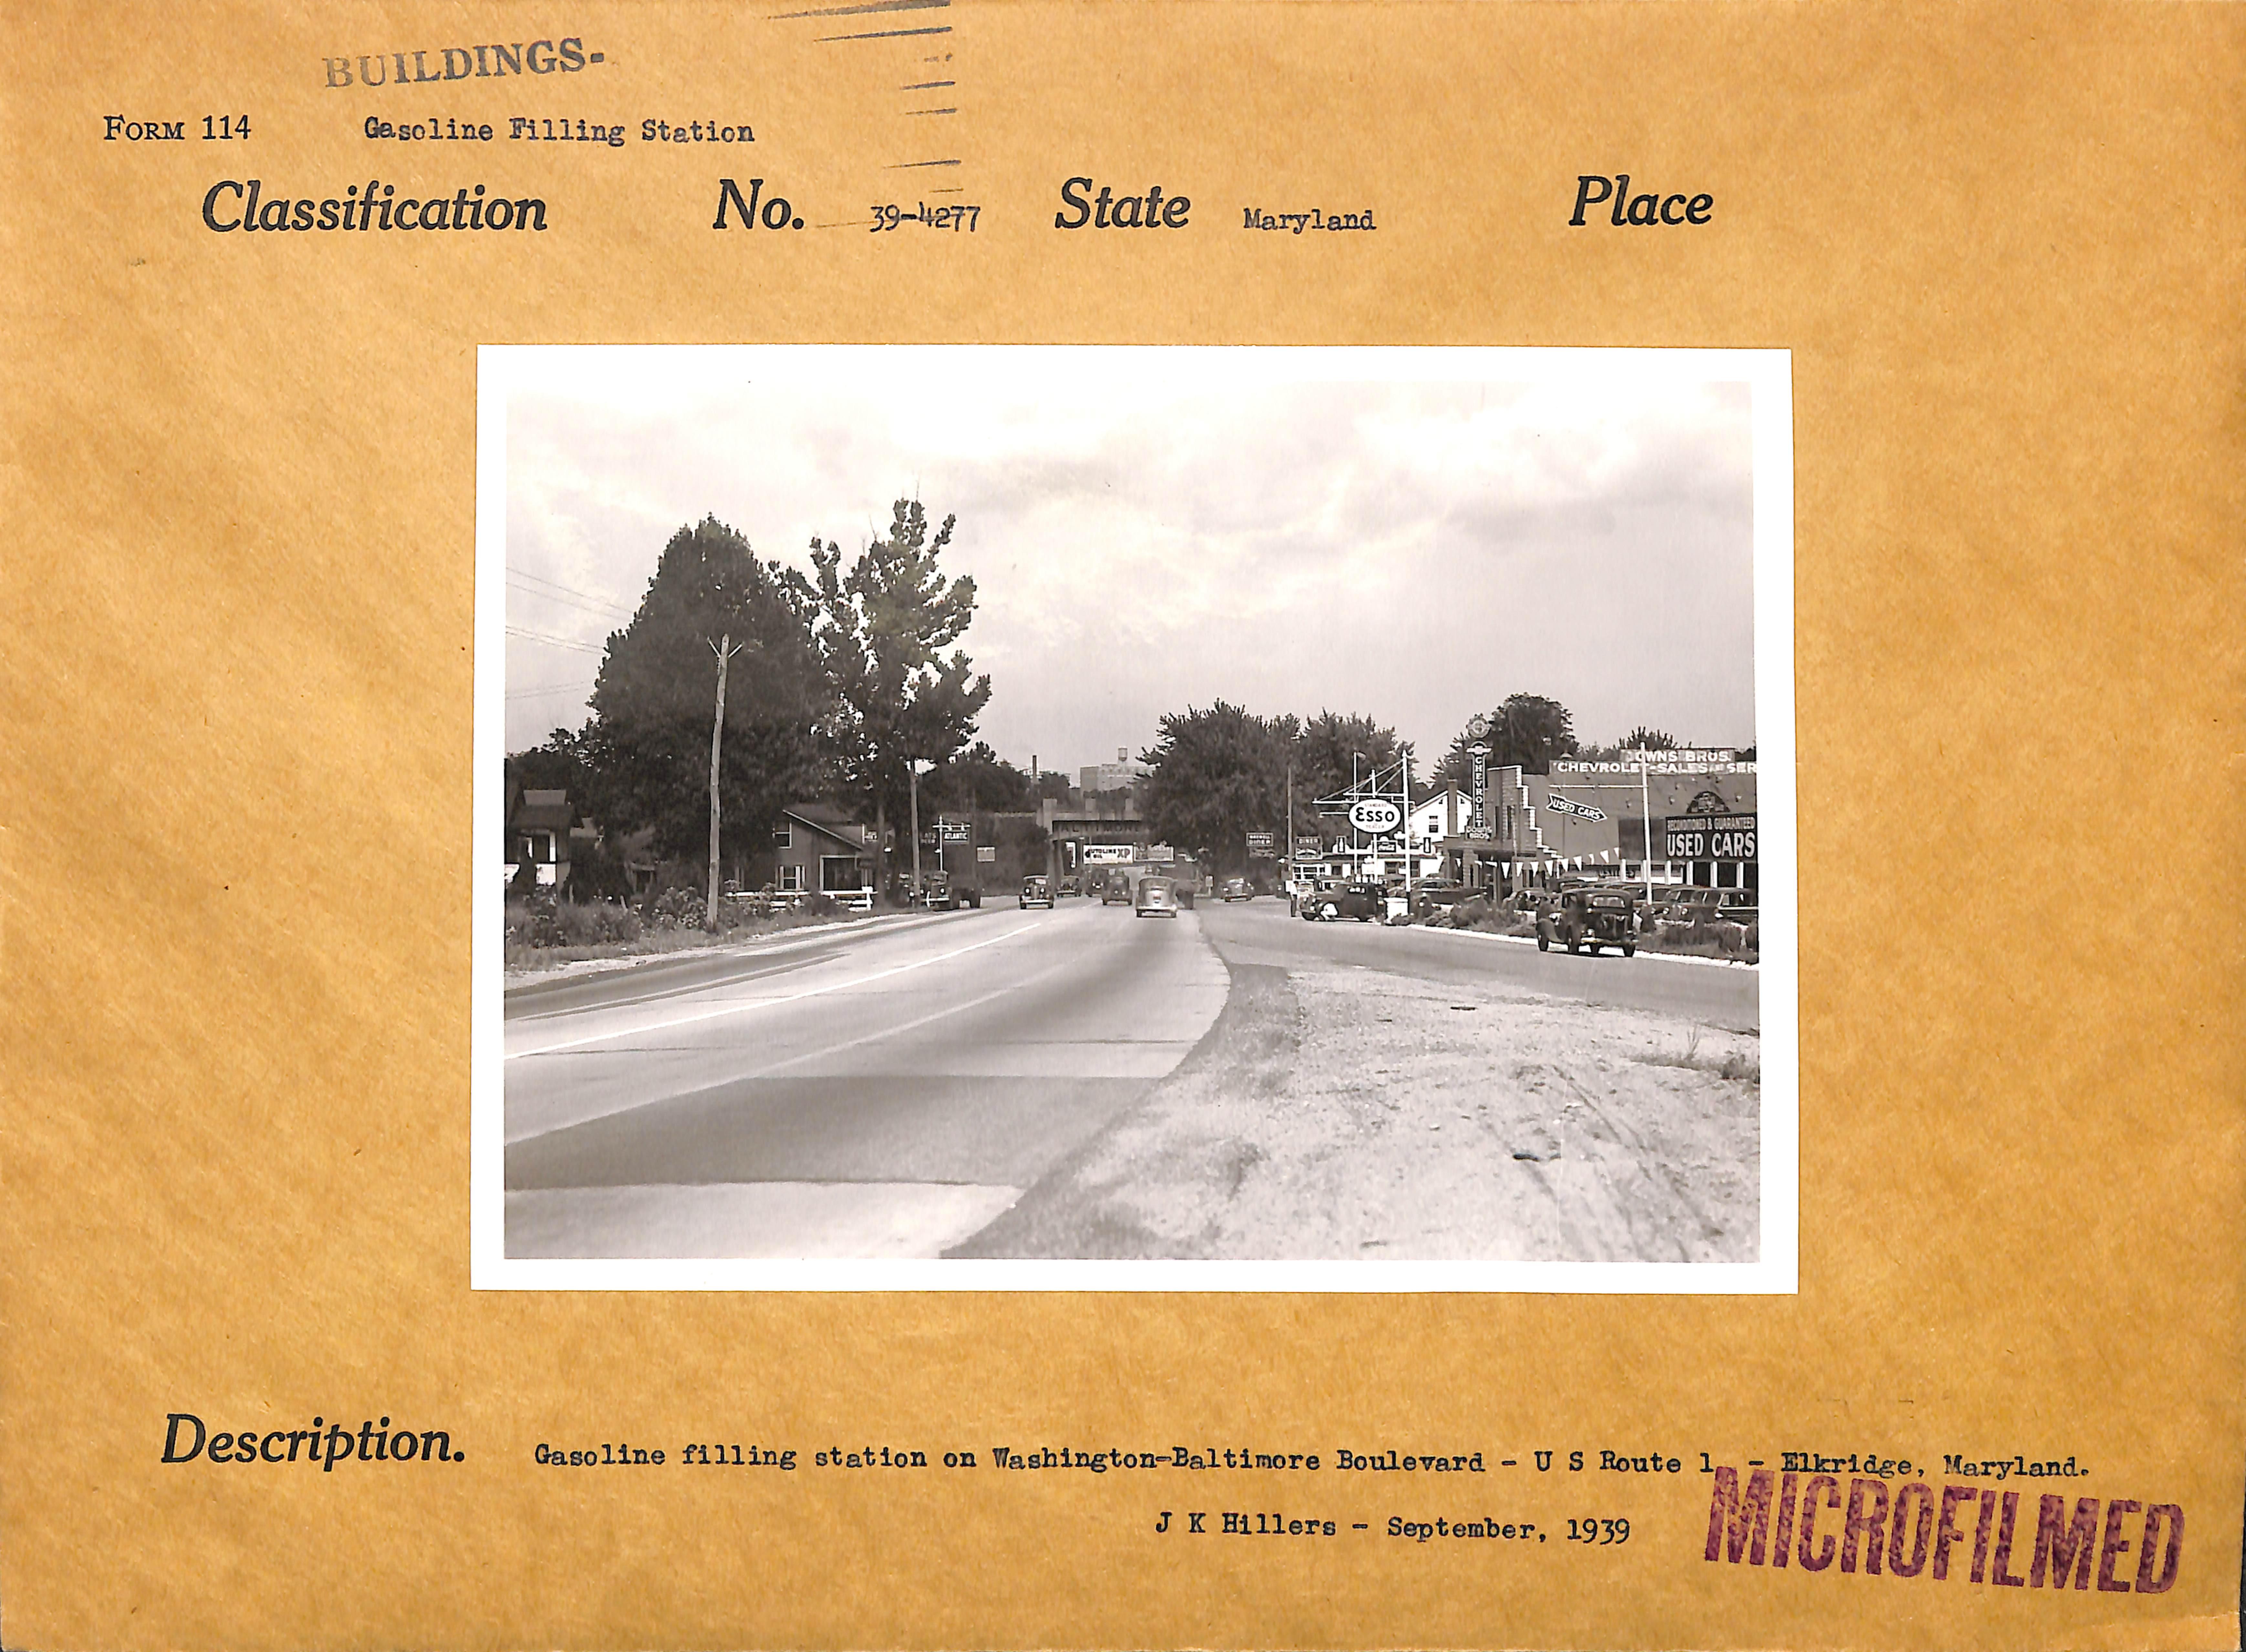 photograph of street scene